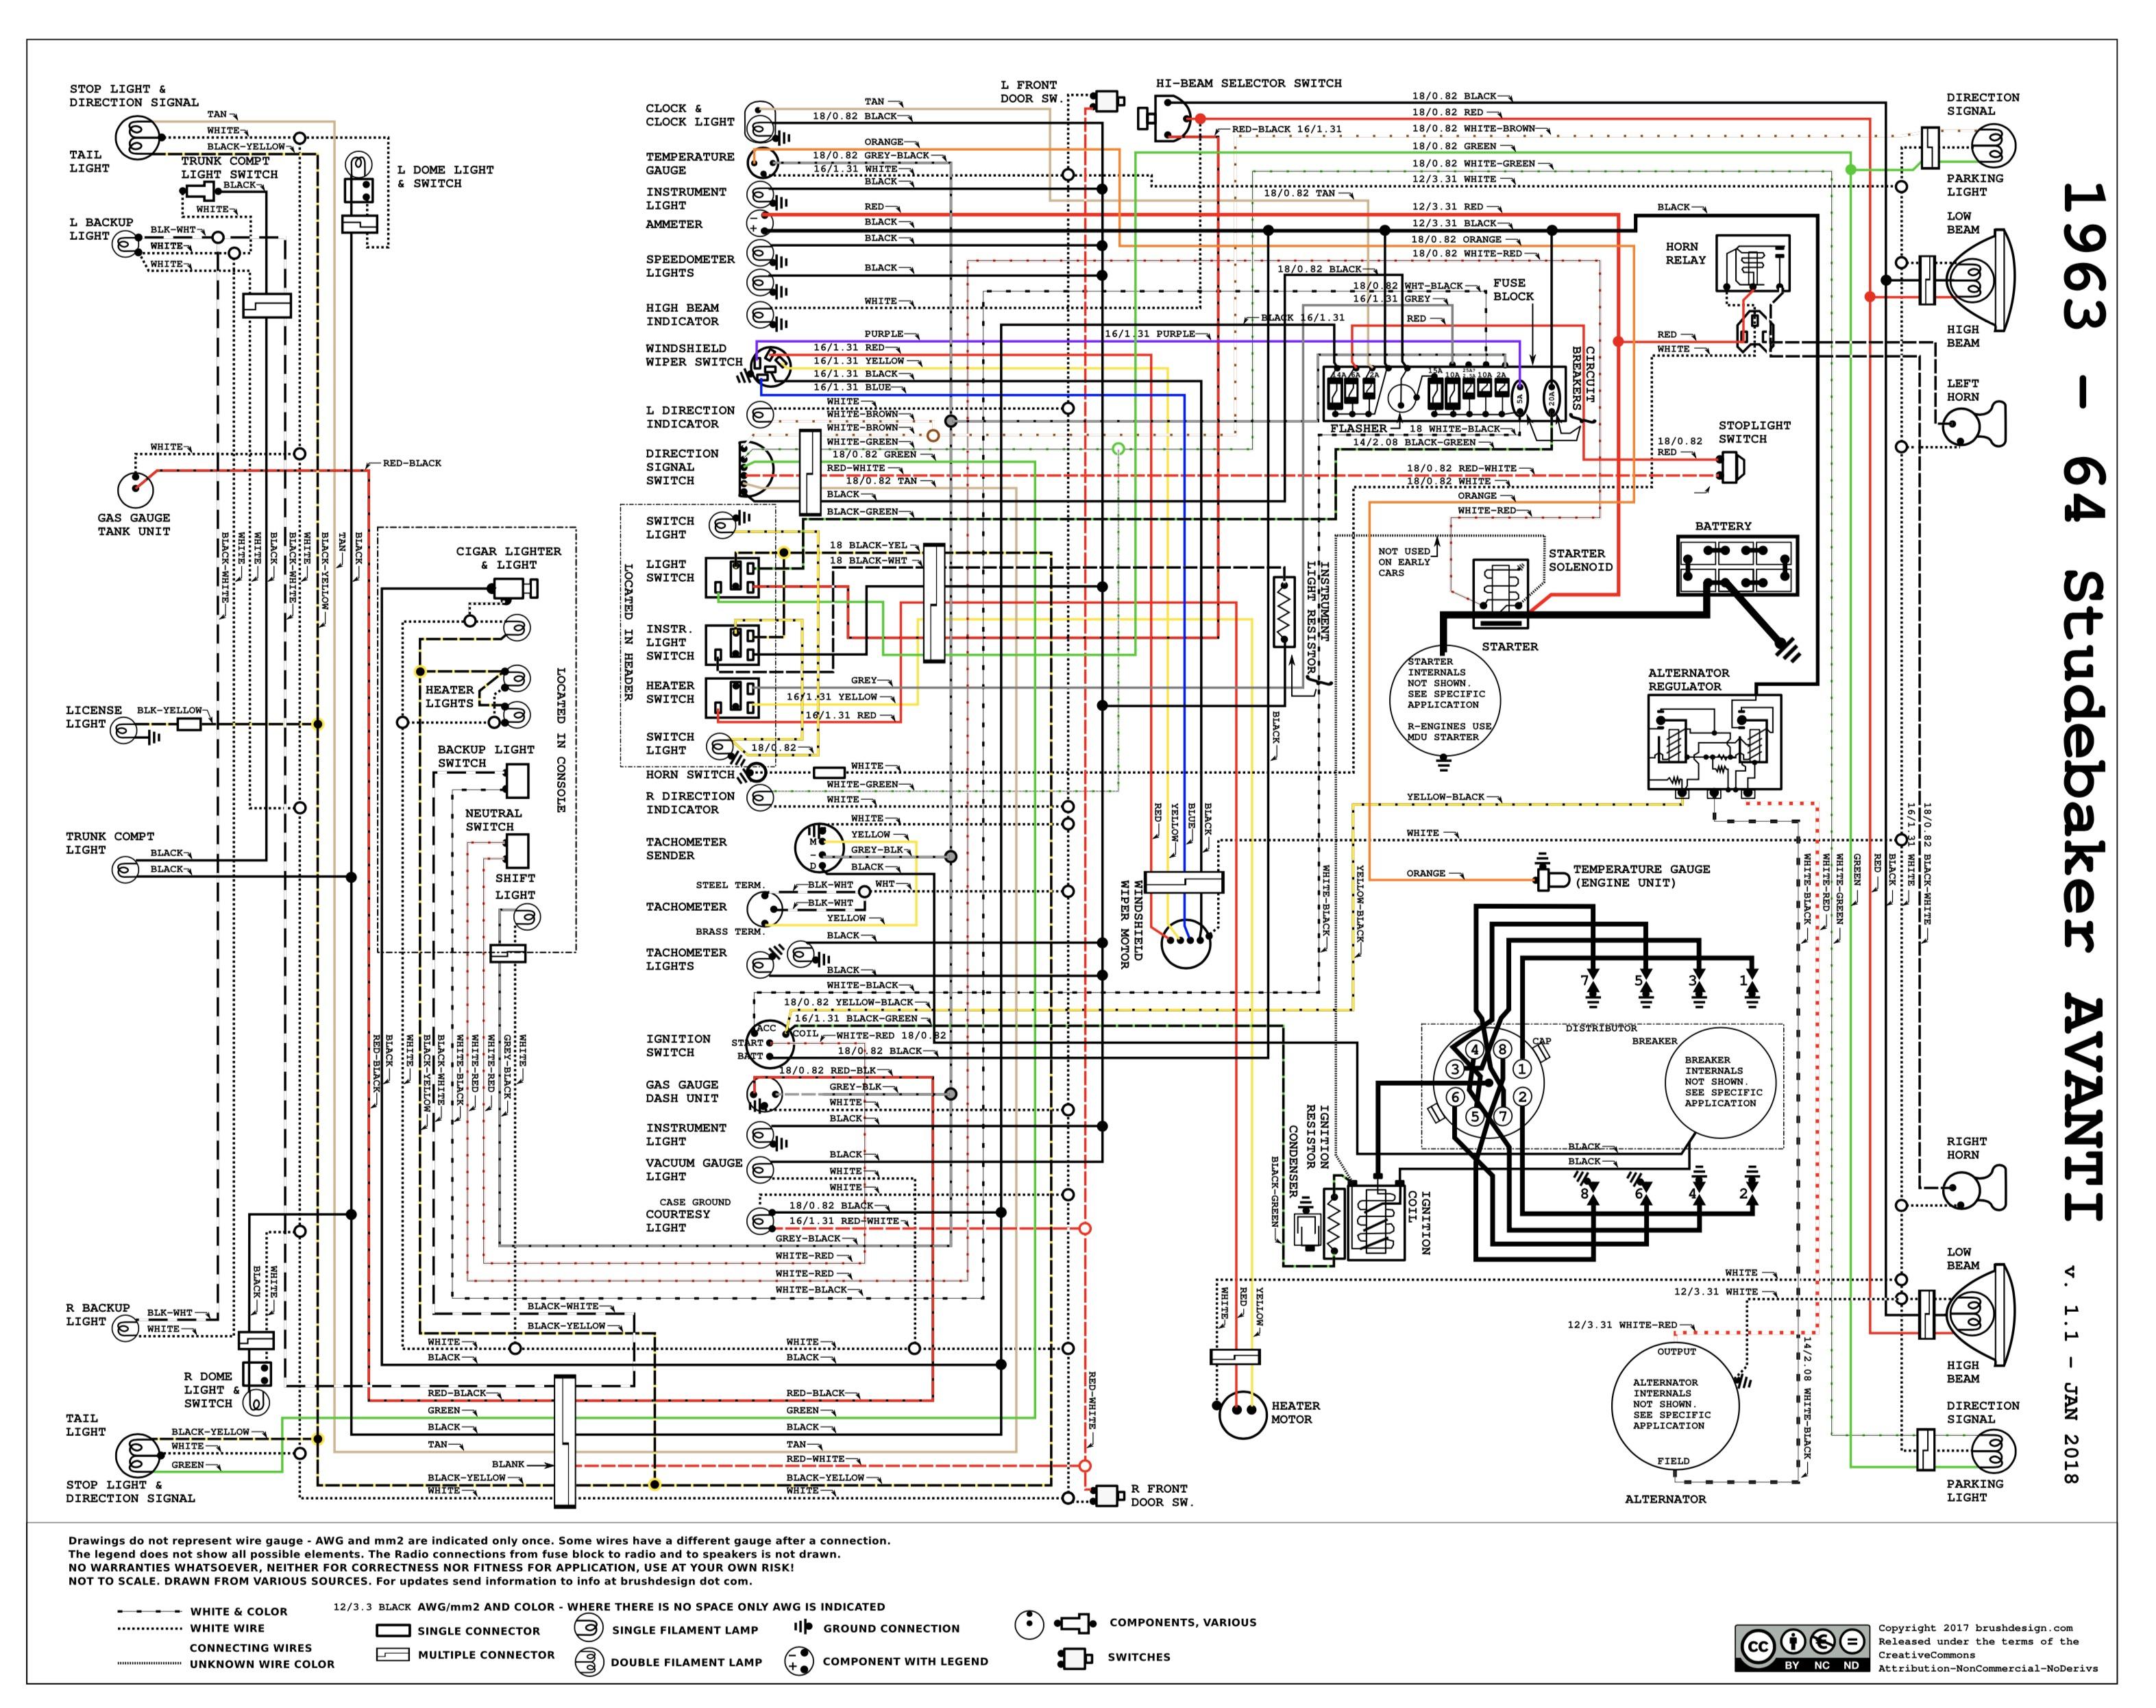 63x64Avantiwirerenato.jpg